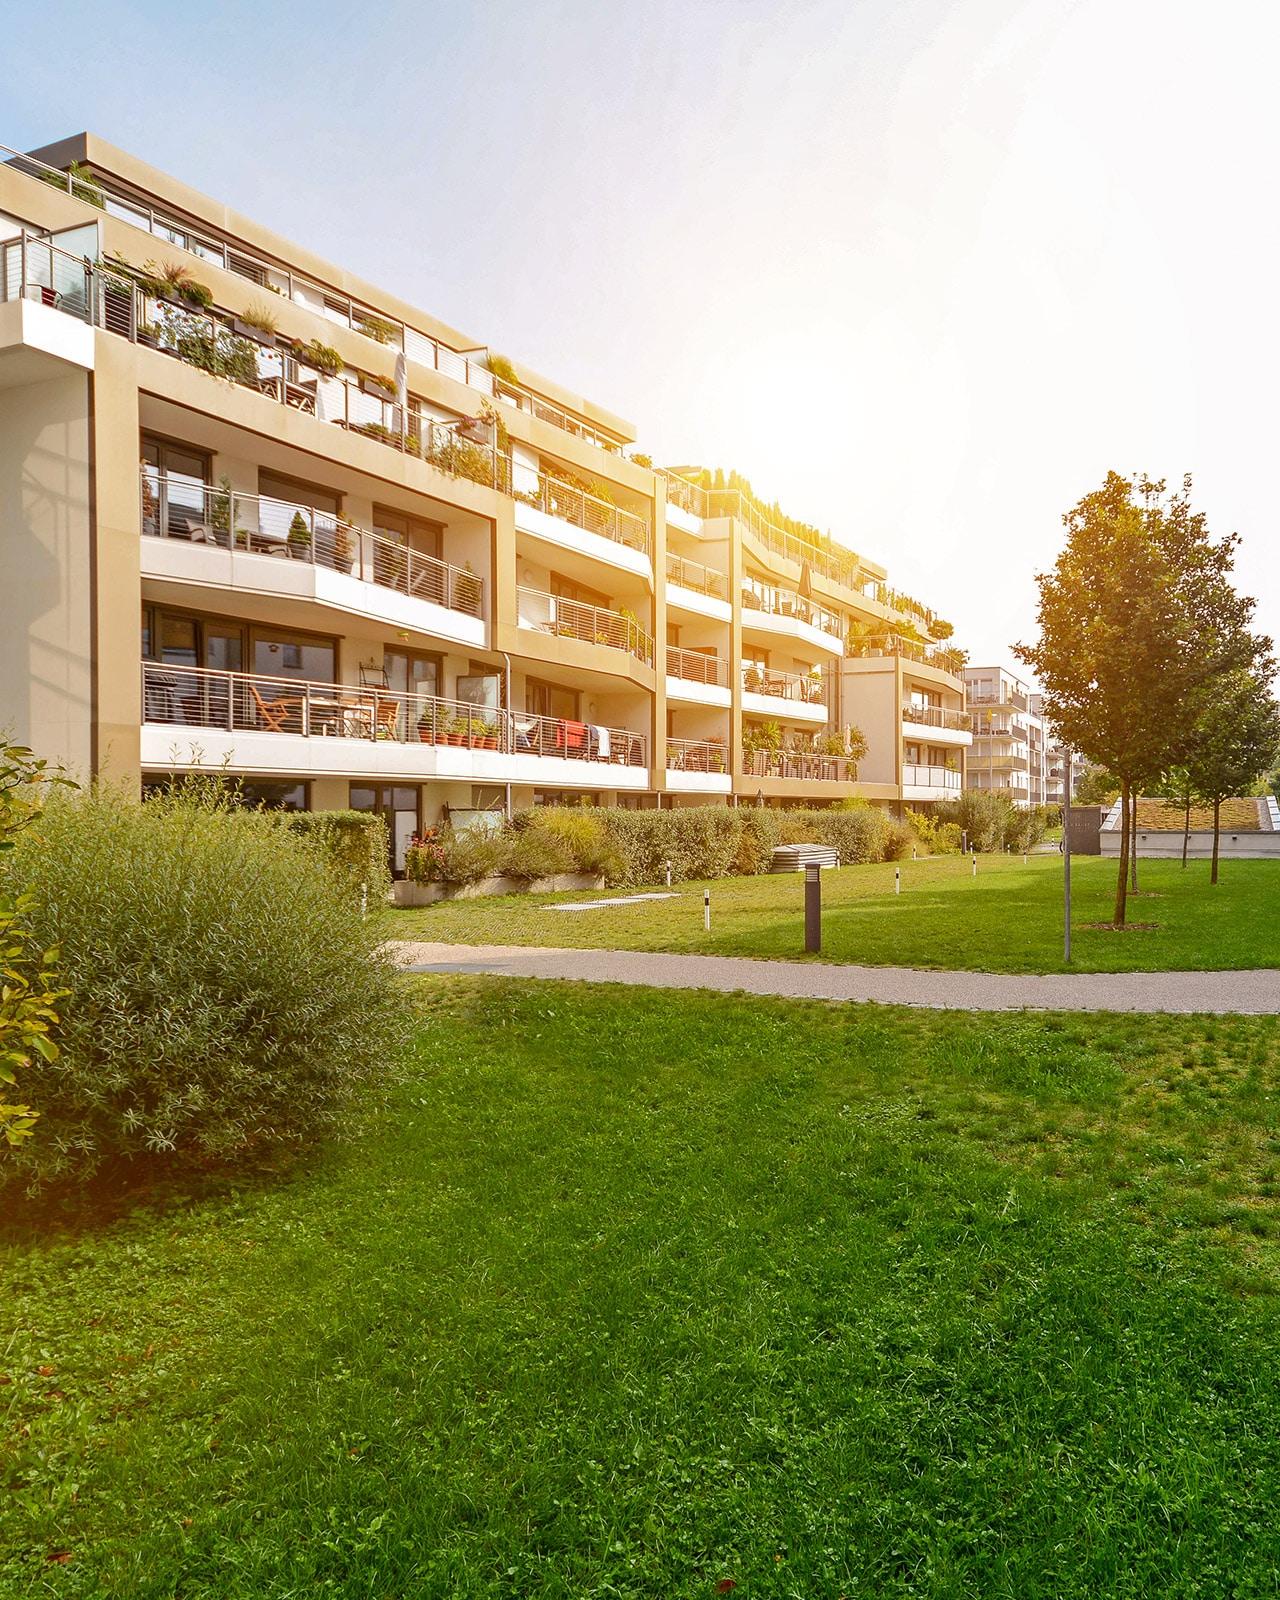 Entretien-jardinnage-jardin-parc-copropriete-hyeres-83400-Var